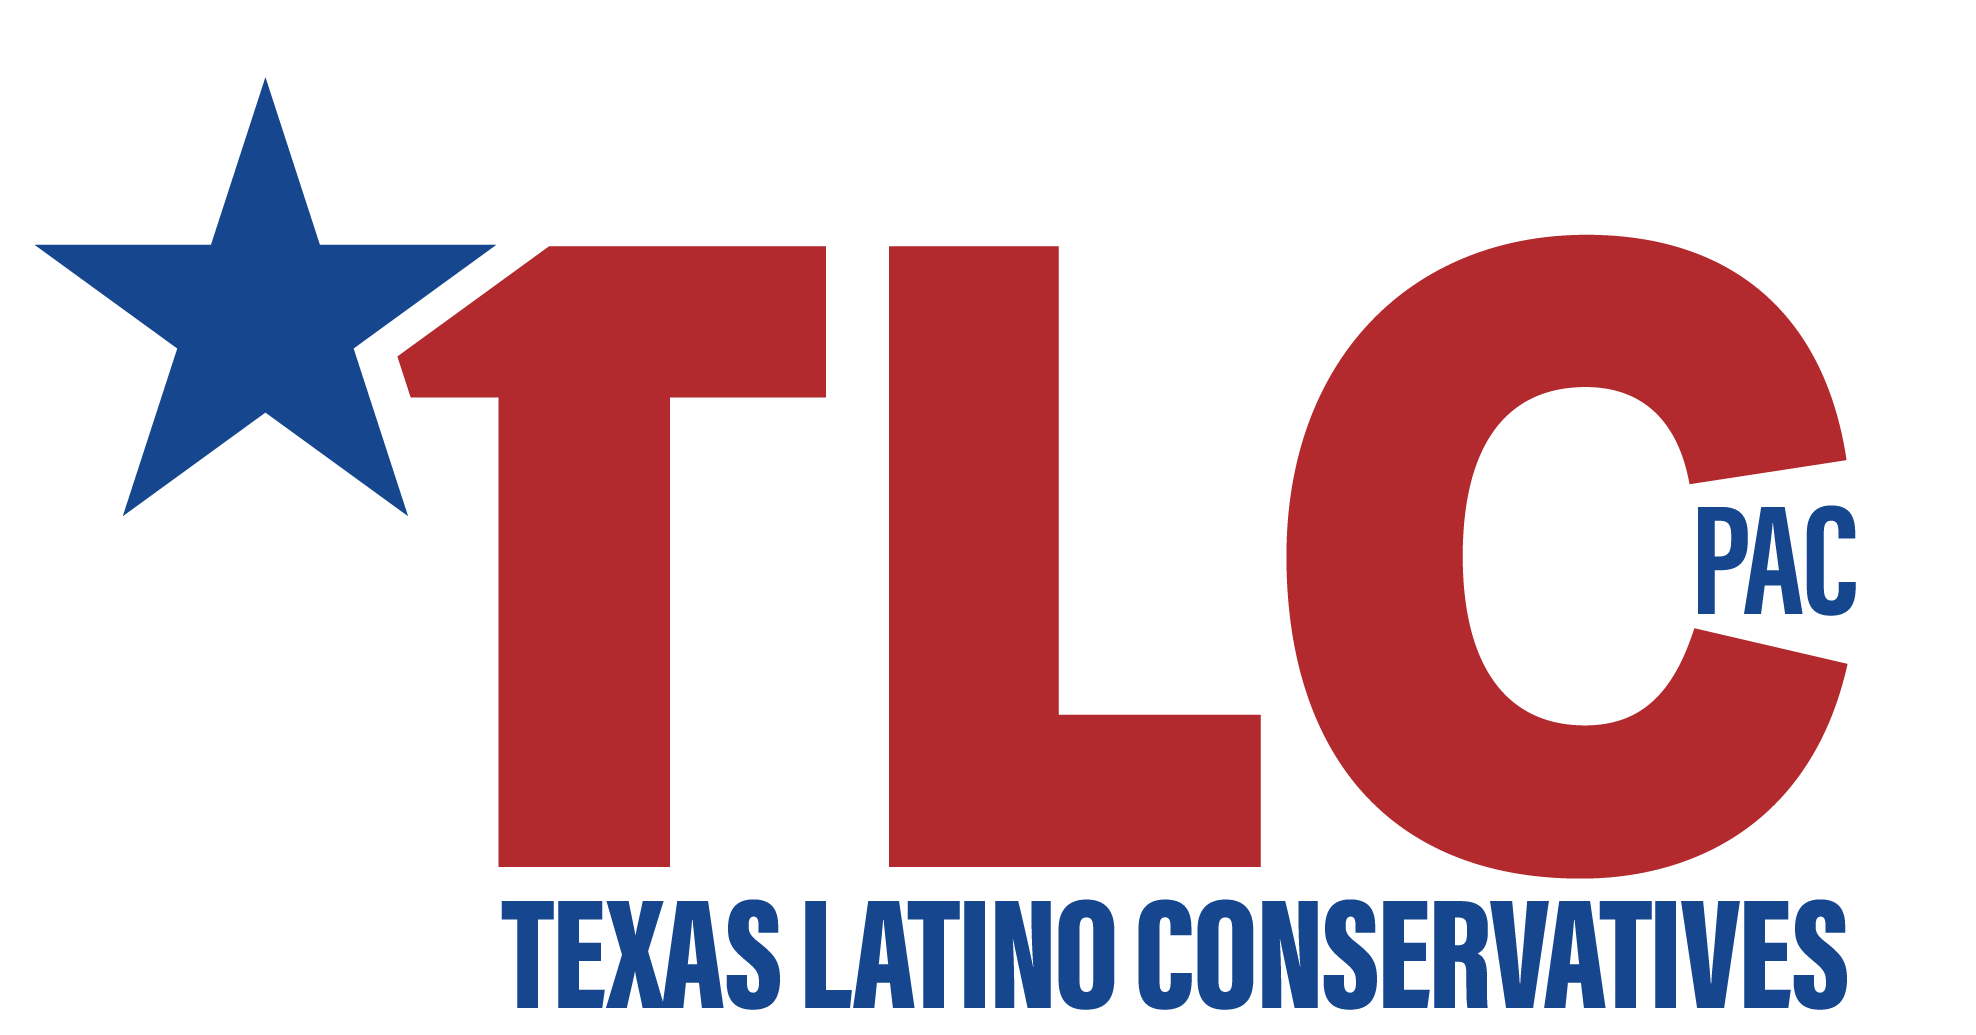 Texas Latino Conservative PAC